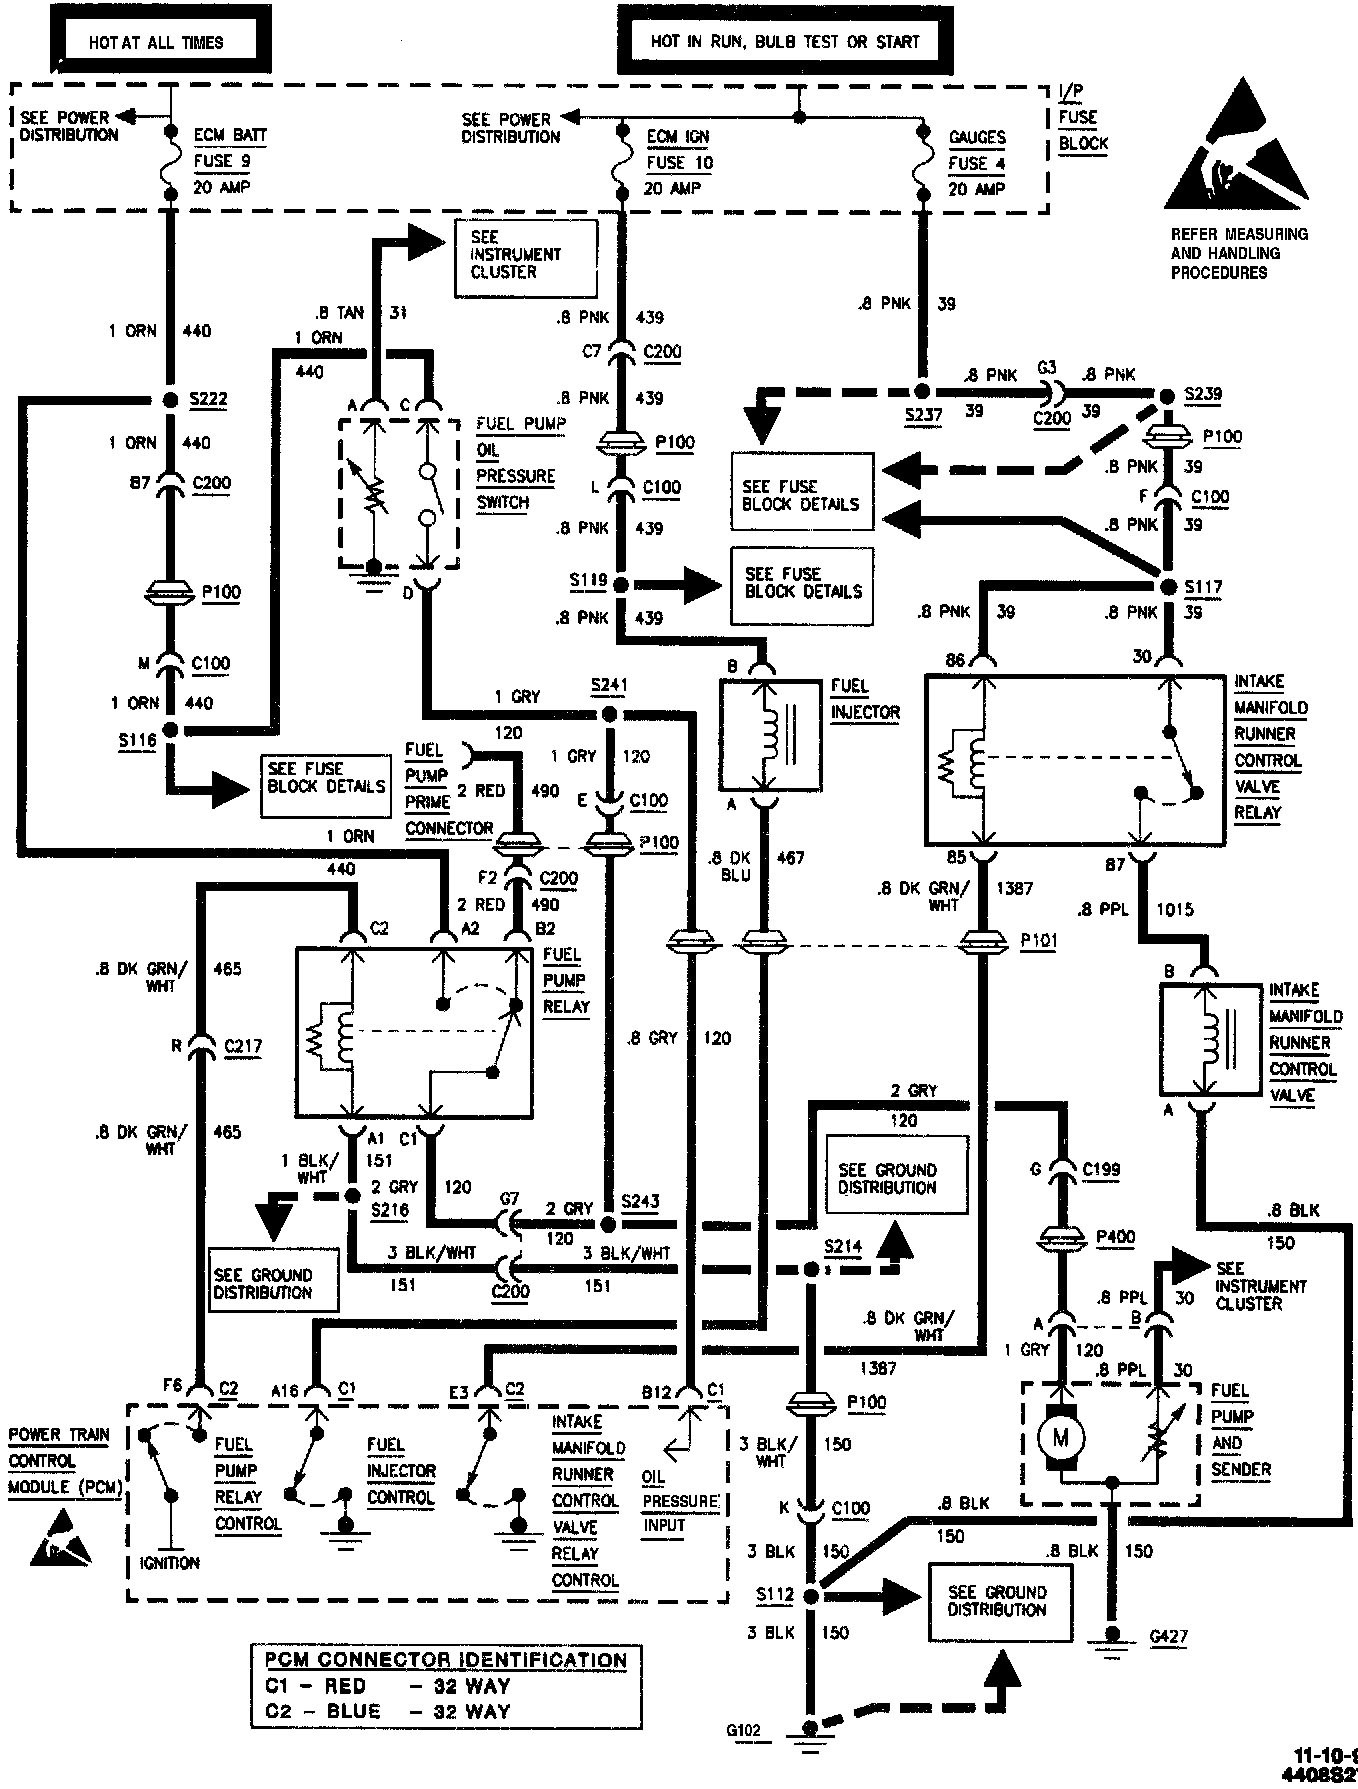 Wiring Diagram Likewise Led Light Bar 1998 Chevy Blazer On 2000 S10